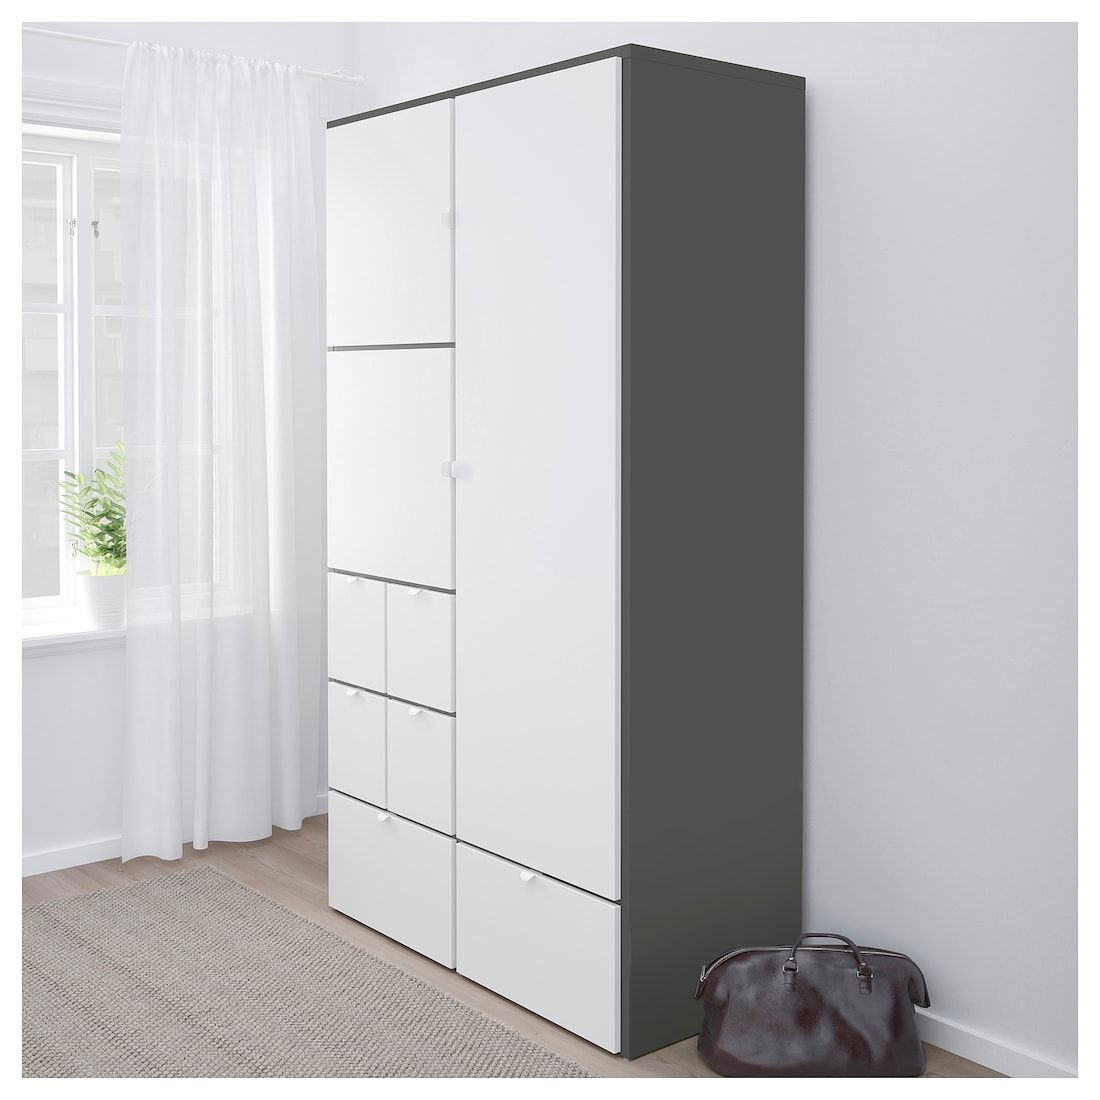 Visthus Kleiderschrank Grau Weiss Ikea Kleiderschrank Grau